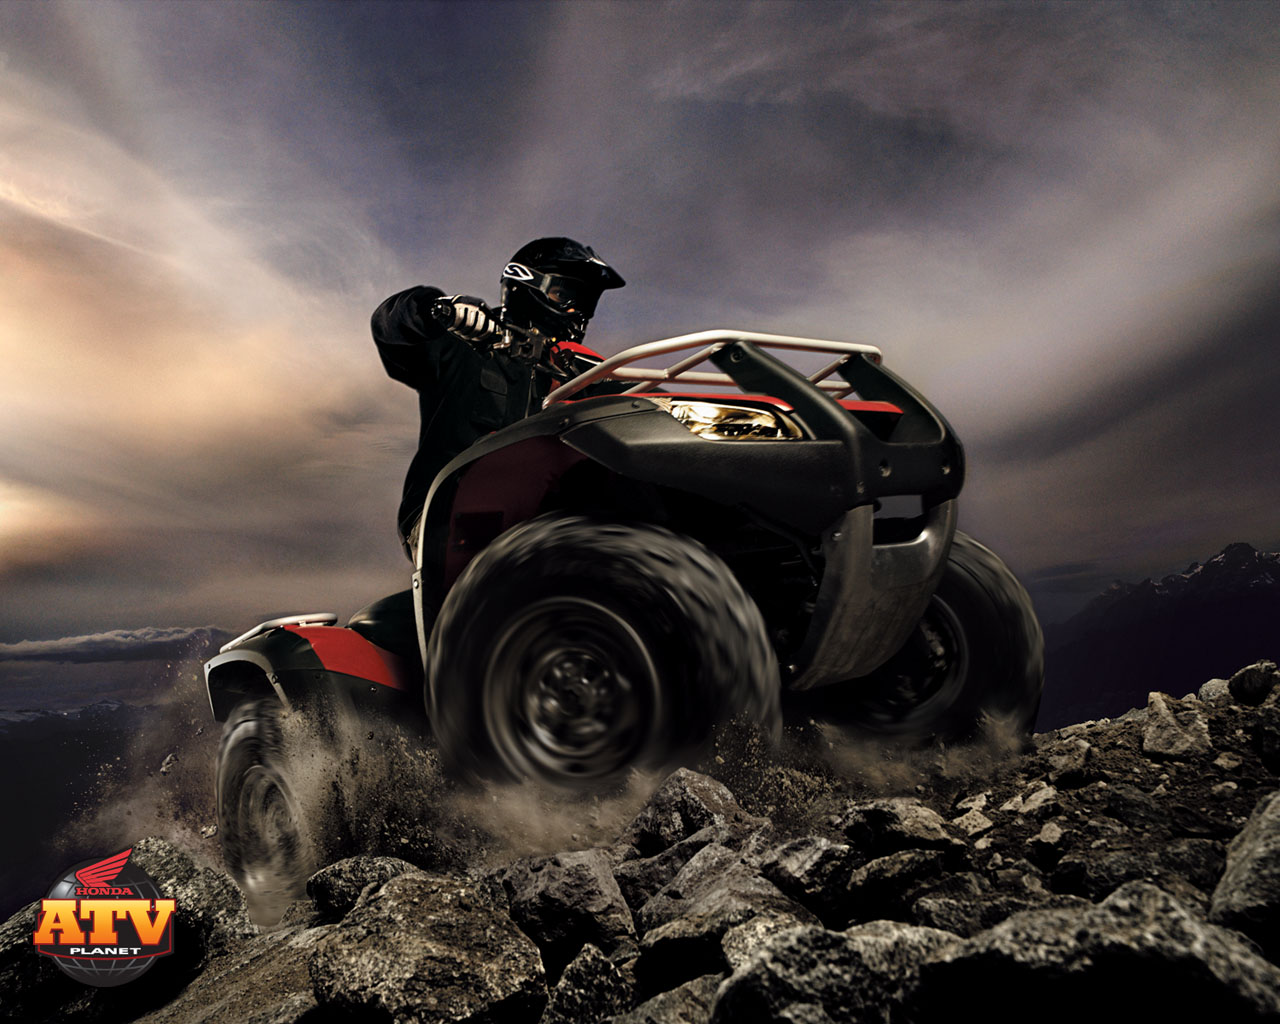 274kB ATV Media Pictures Videos Sound Clips All Honda ATV Media 1280x1024